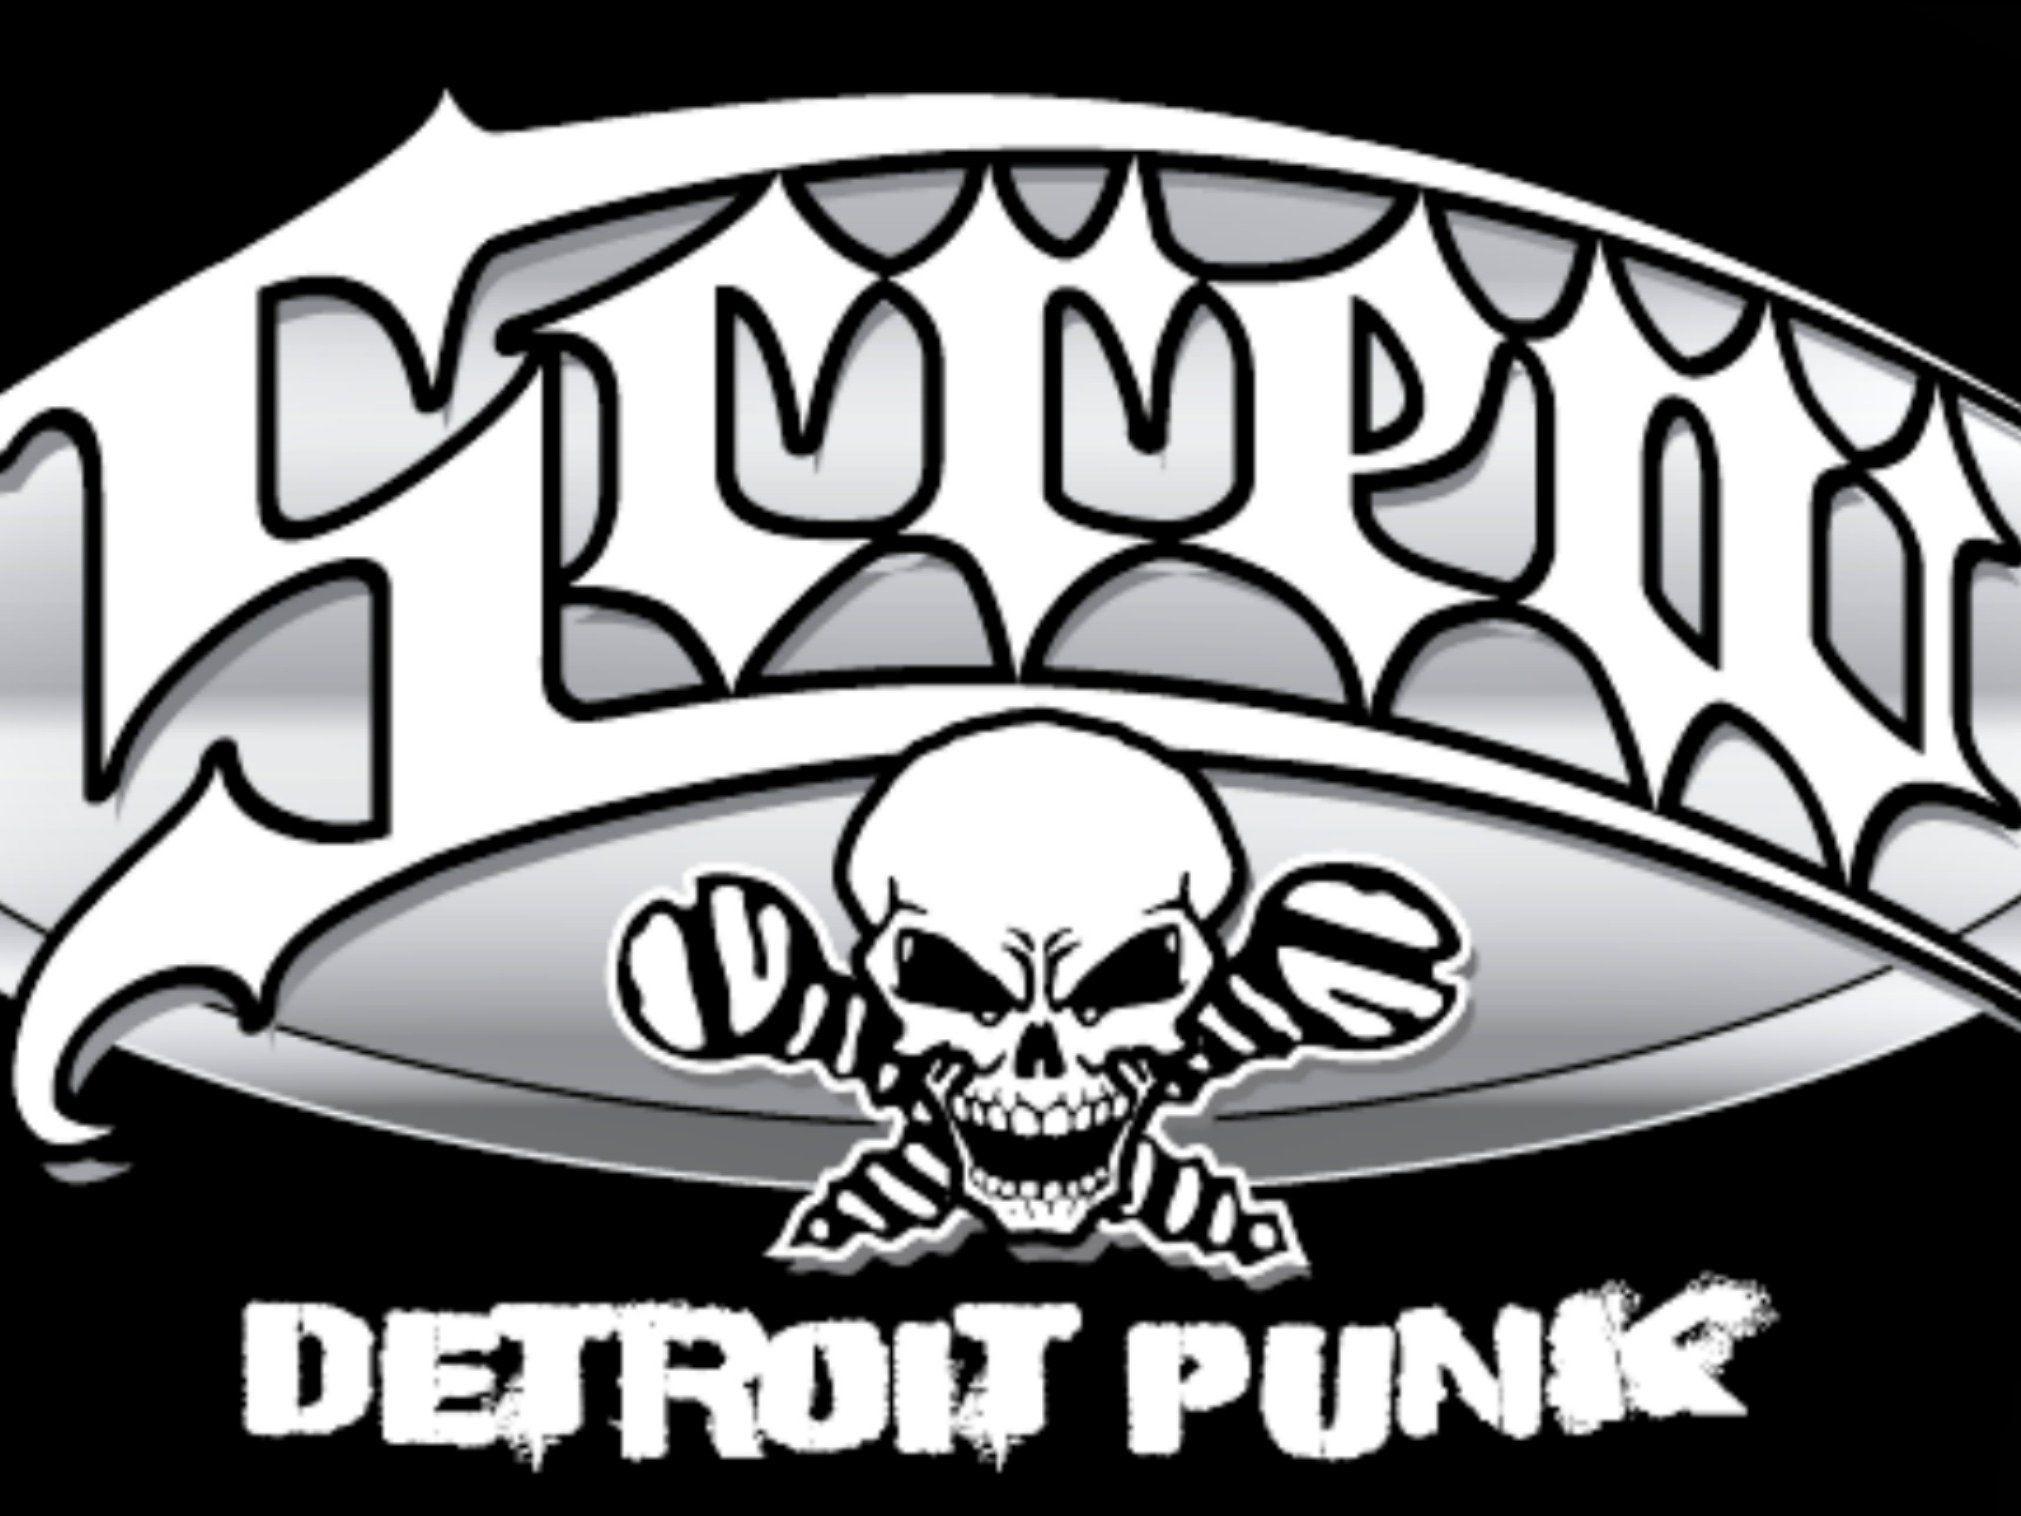 Checkoutscrewonreverbnation detroit punk music